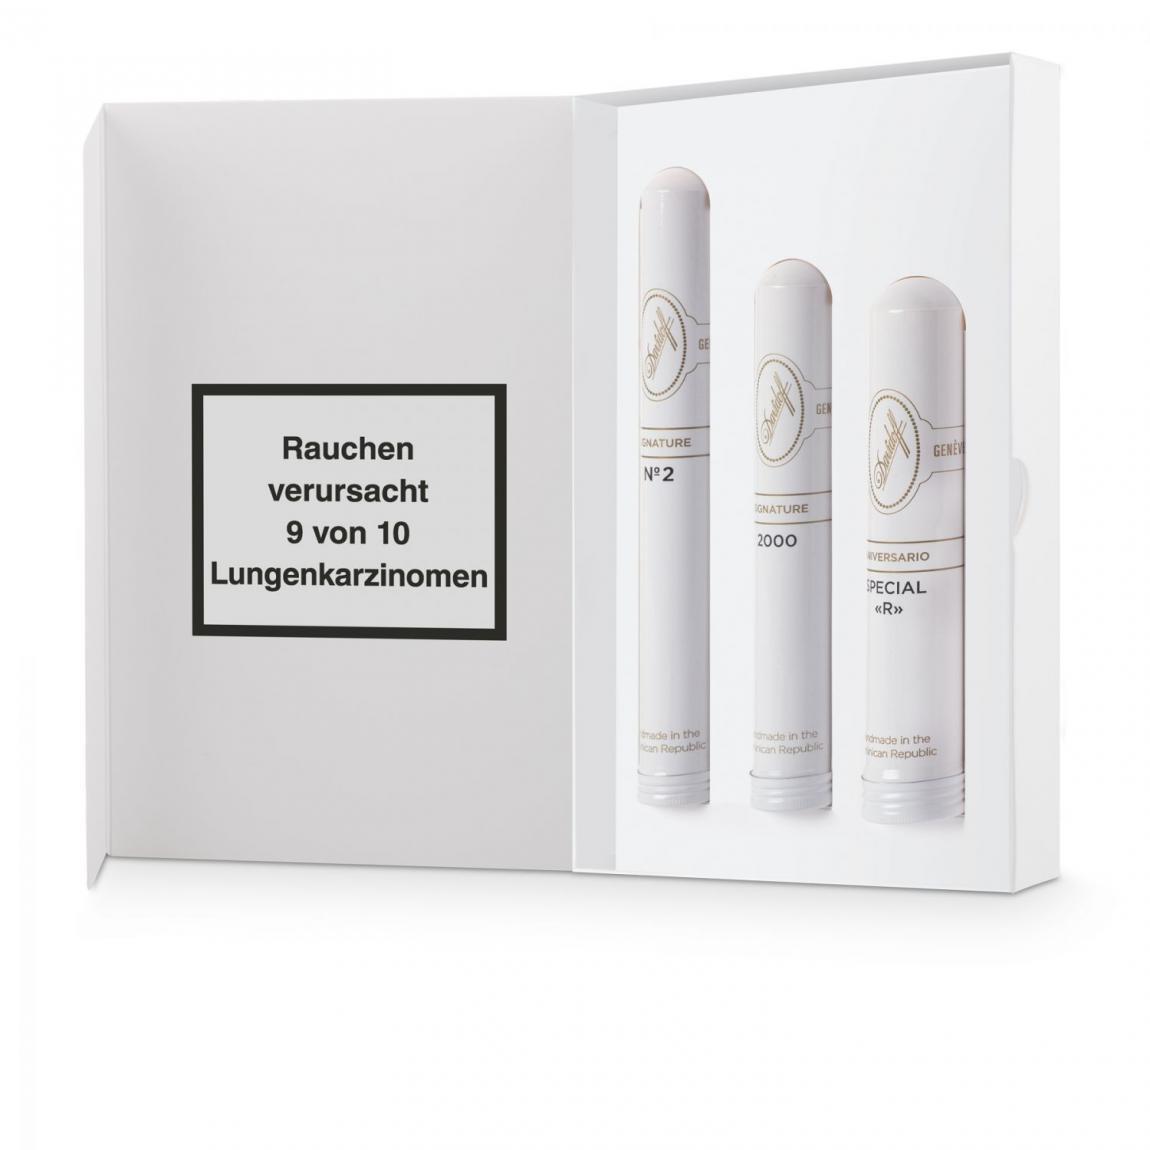 Davidoff Tubos Selection White Sampler, 3er Schachtel